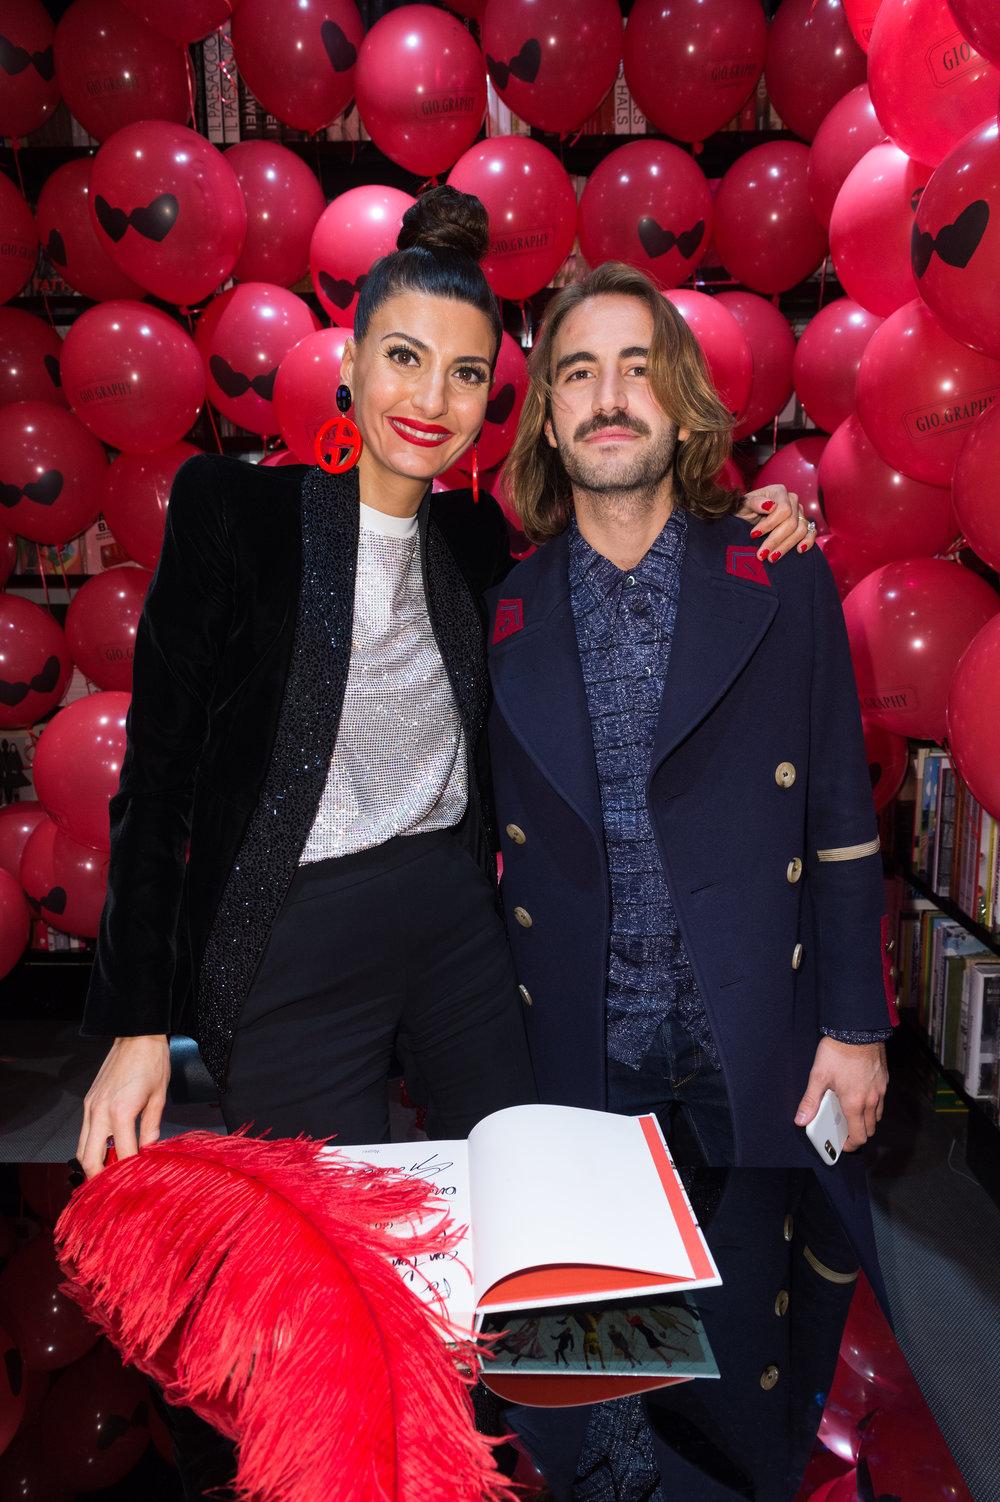 Giovanna Engelbert & Niccolo Giannico